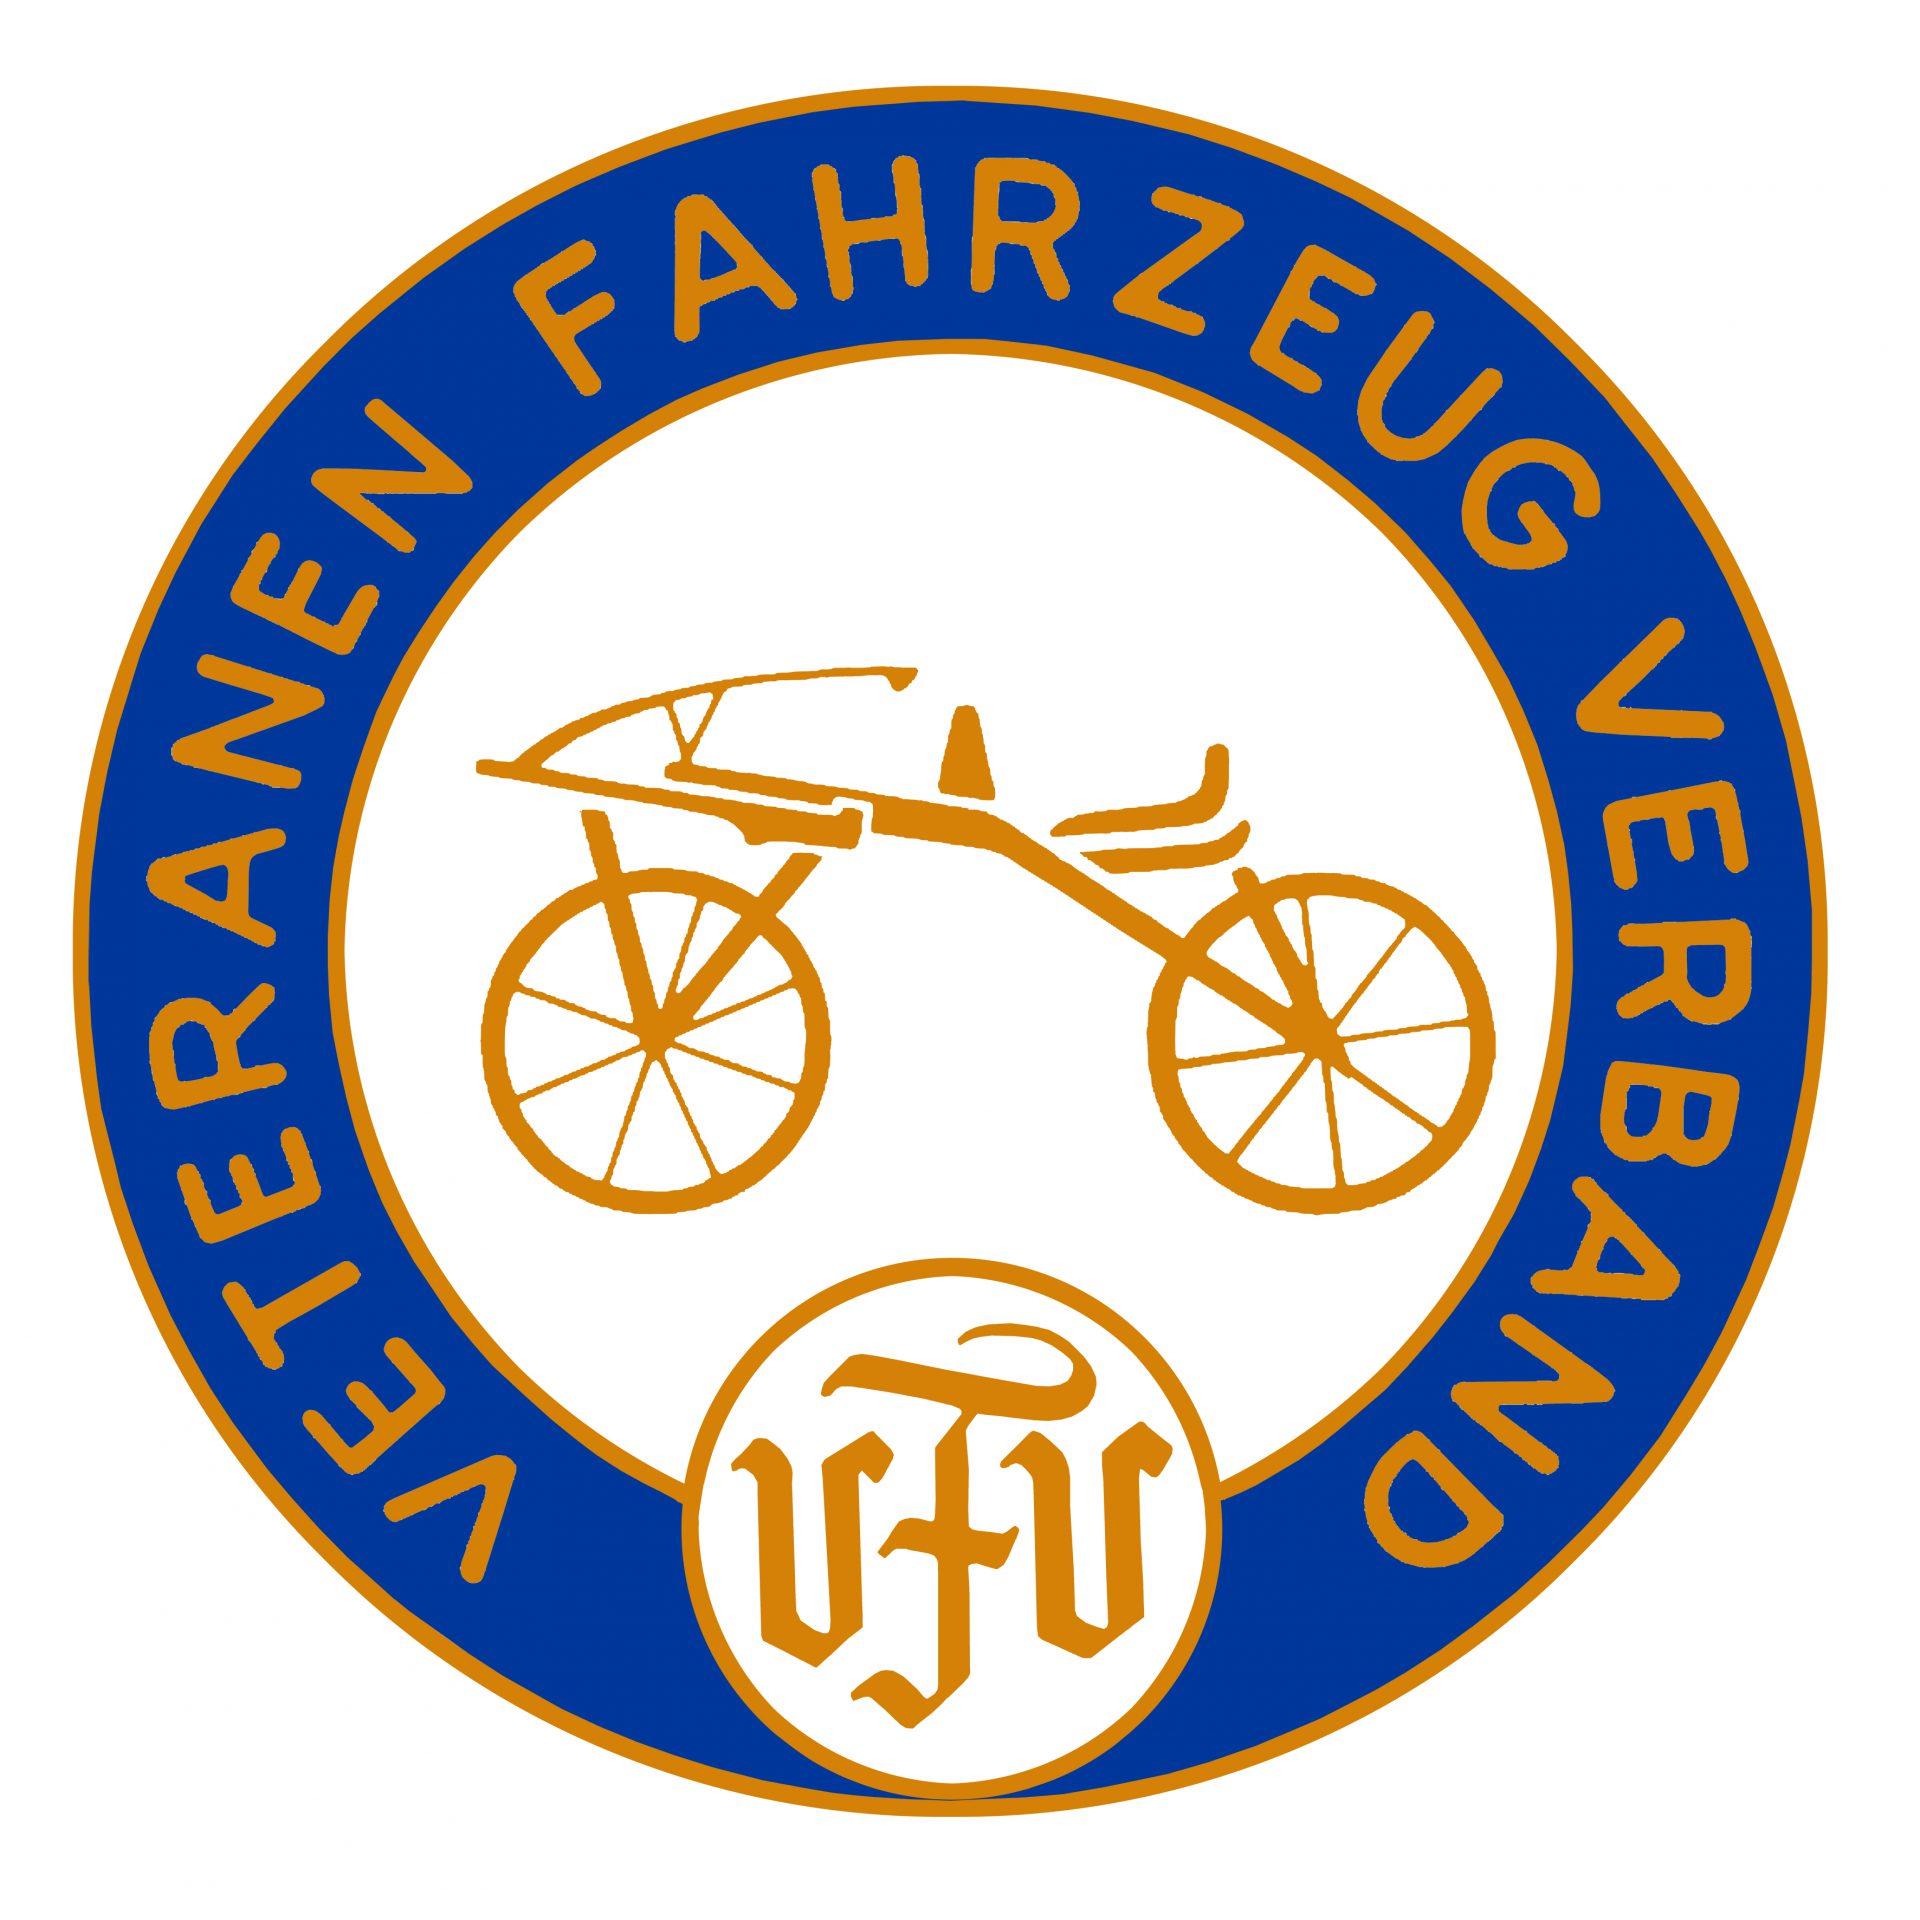 vfv-logo